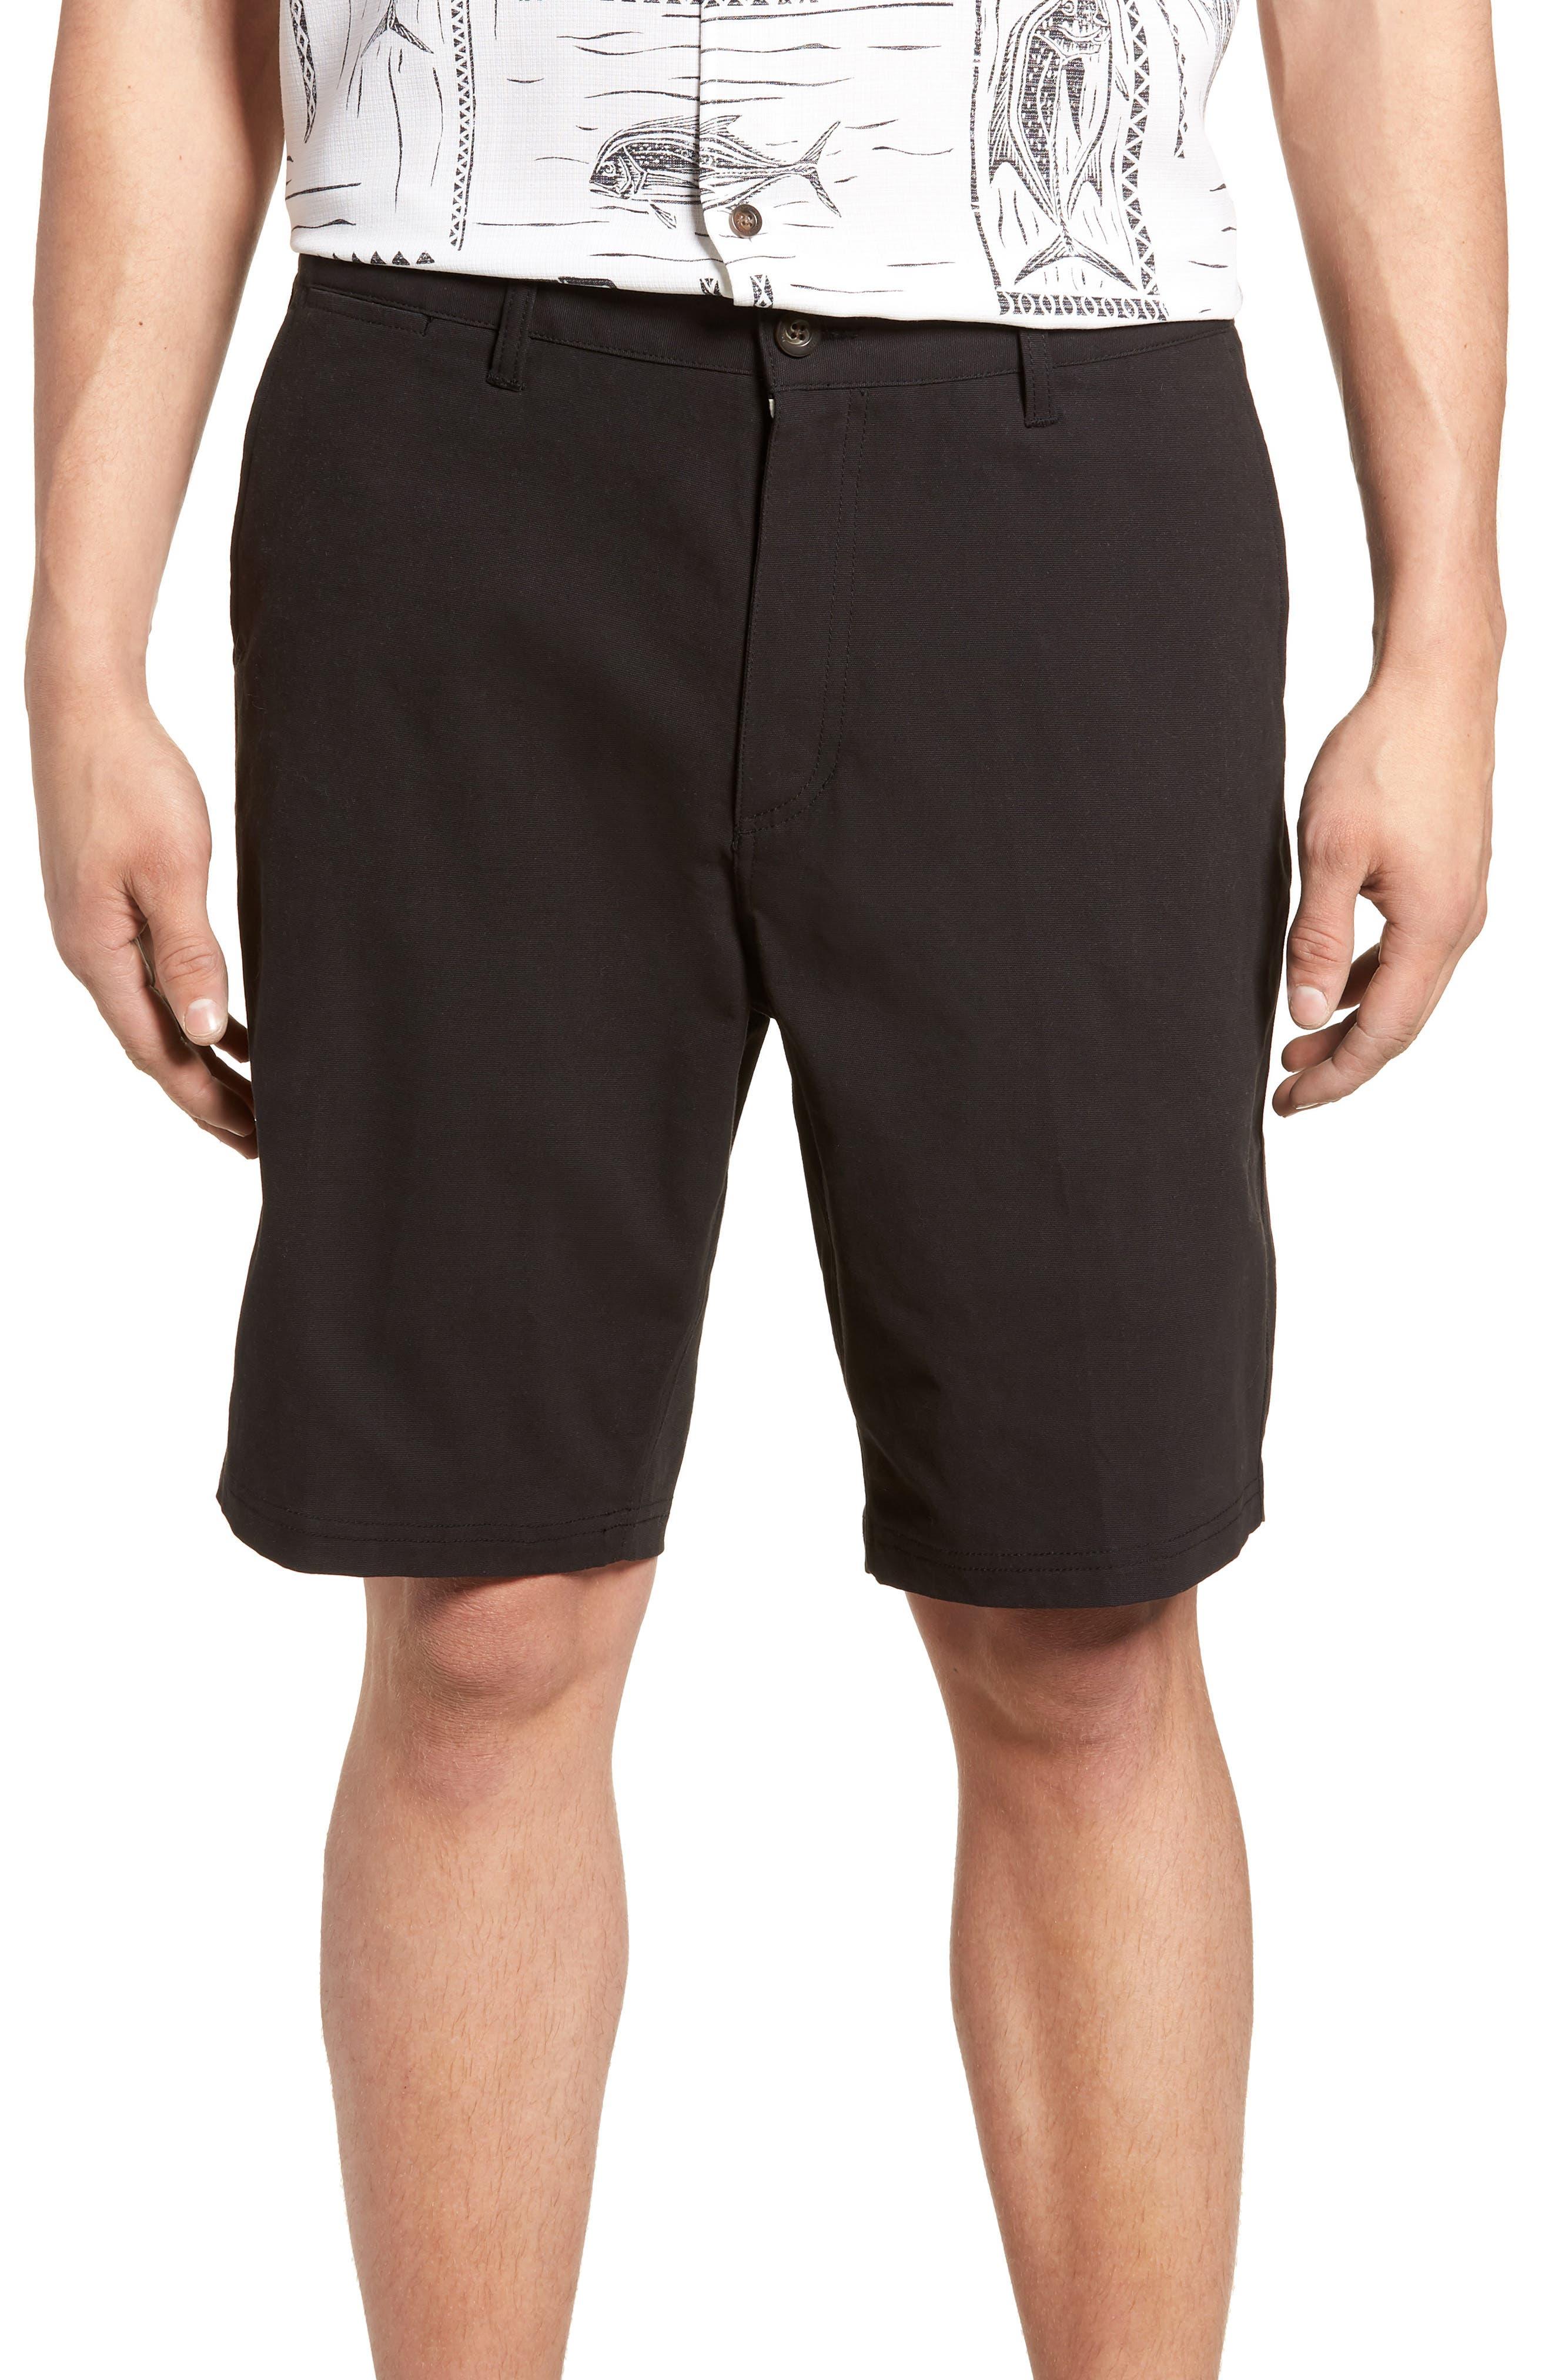 Port Shorts,                         Main,                         color, BLACK